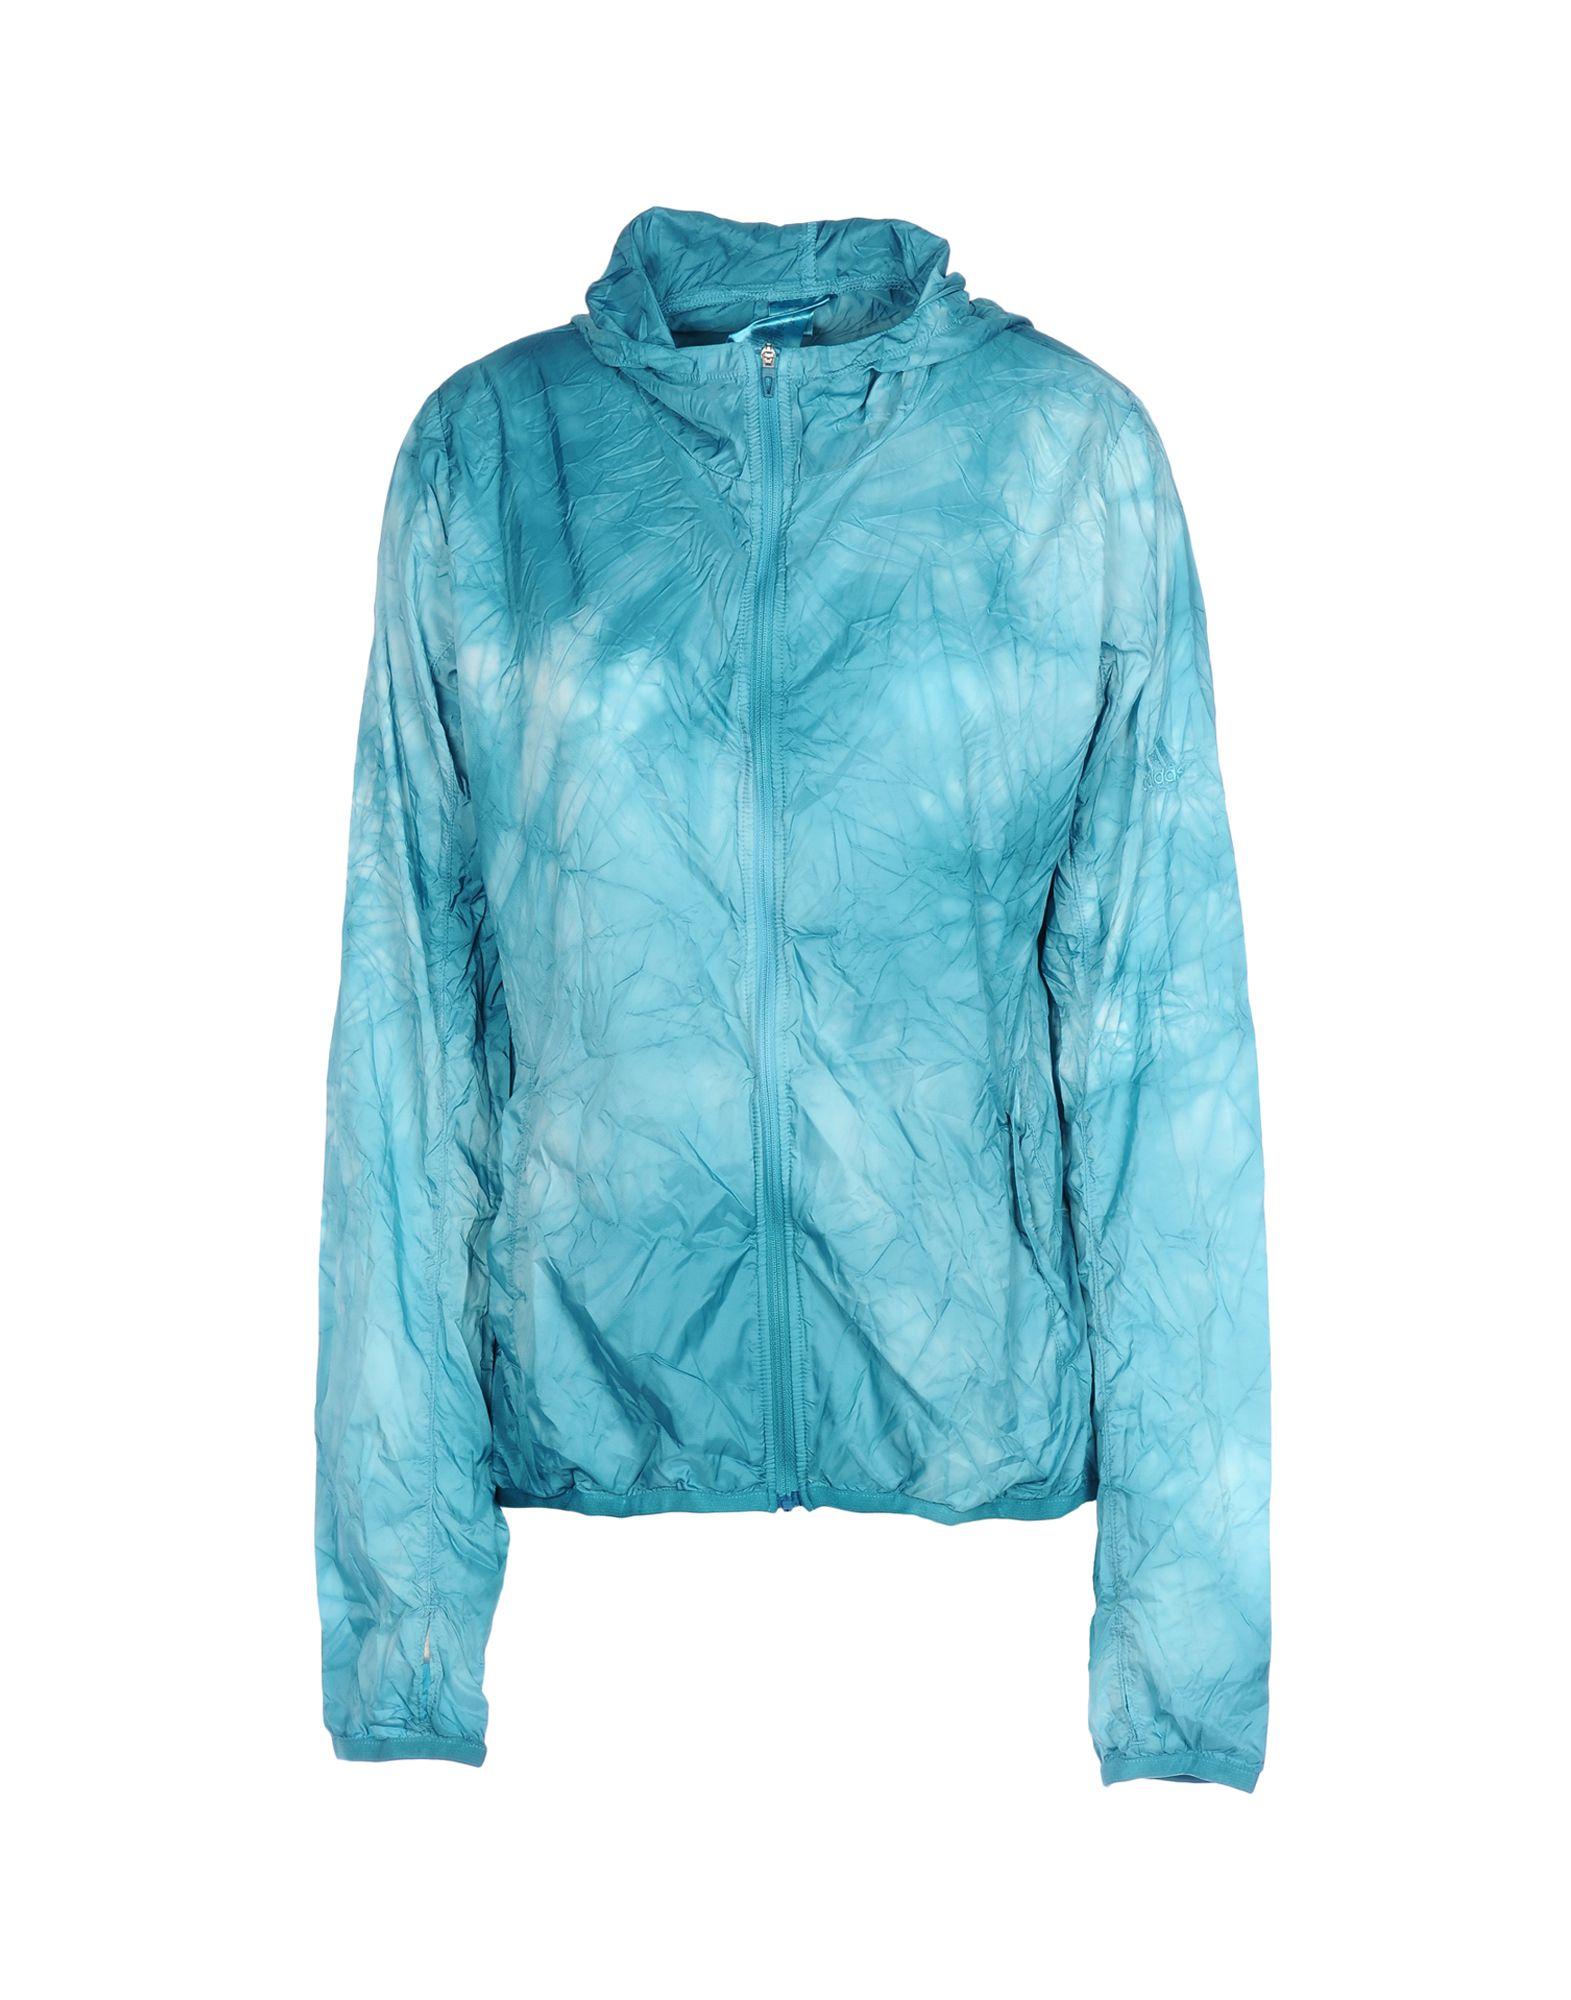 ADIDAS Damen Jacke Farbe Grün Größe 5